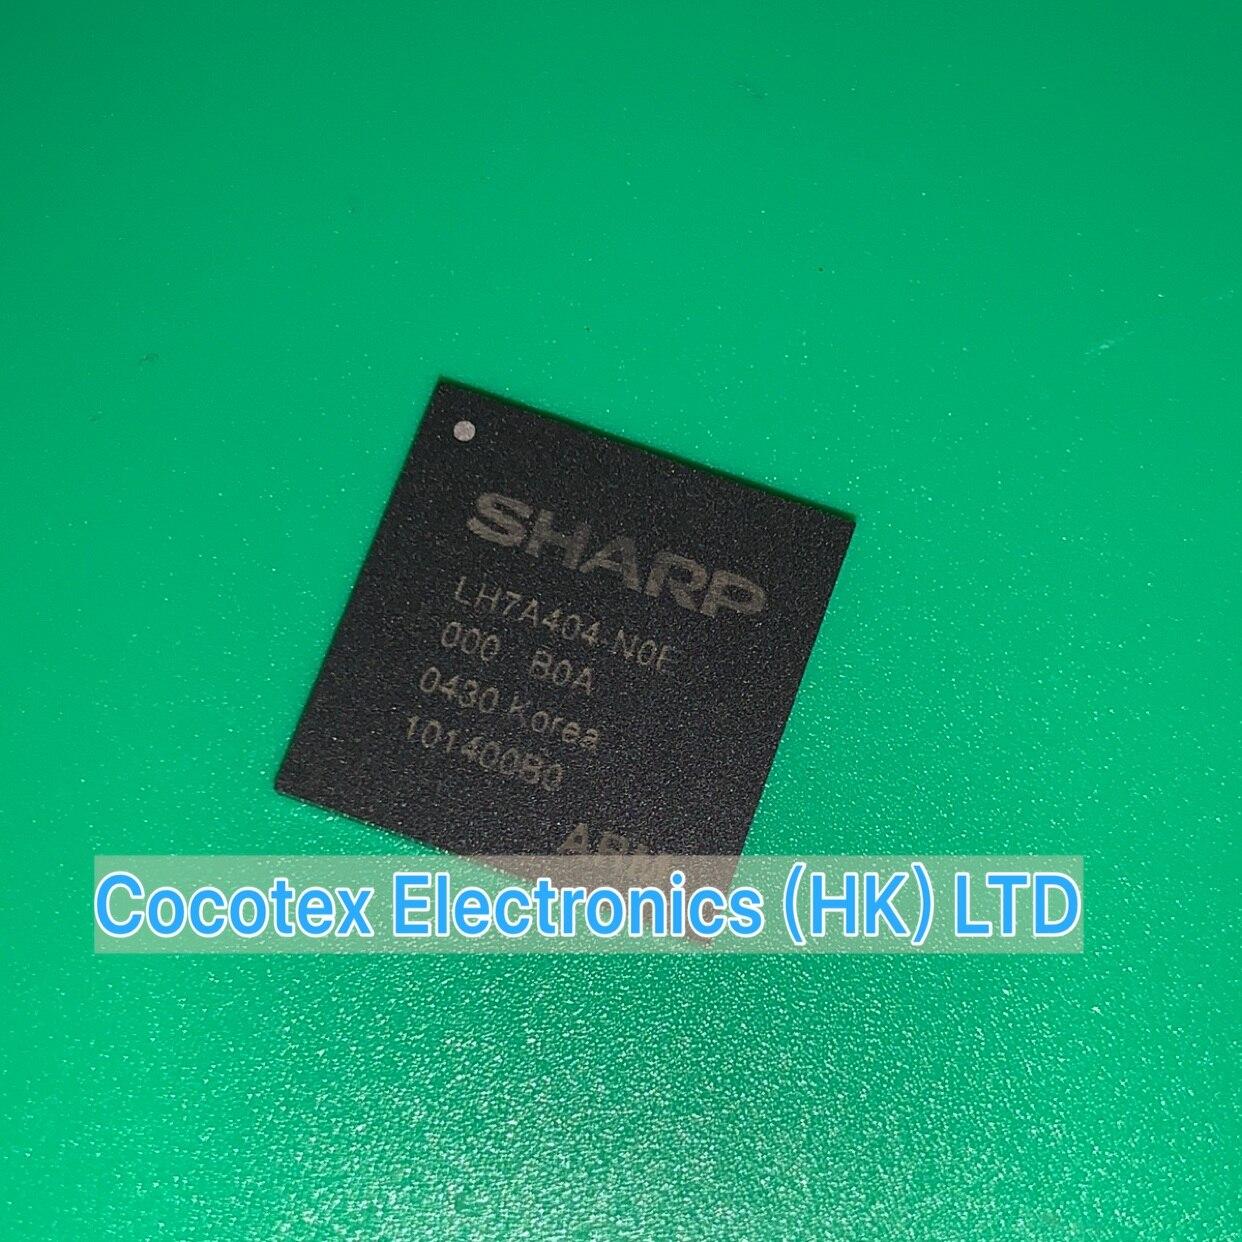 LH7A404-NOE BGA LH 7A404-NOE 32 BIT SYSTEM ON CHIP LH7A404-N0E LH7A404NOE